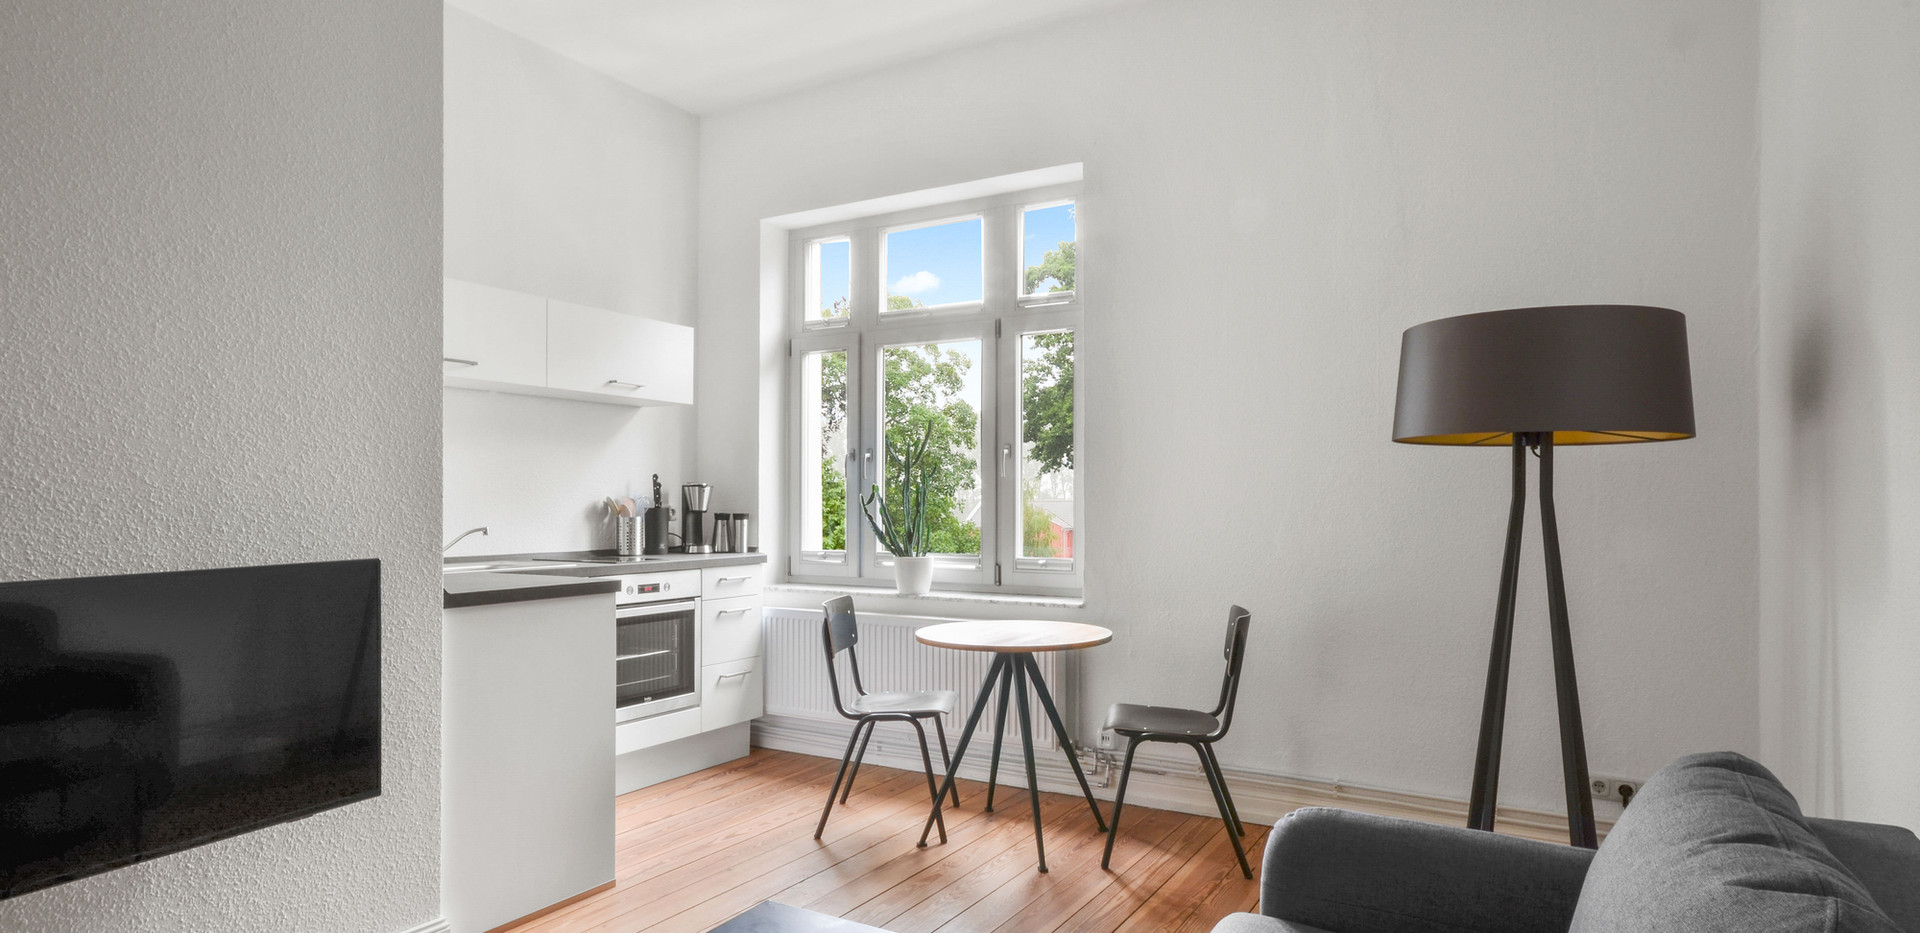 Boardinghouse Rostock - Apartment 8